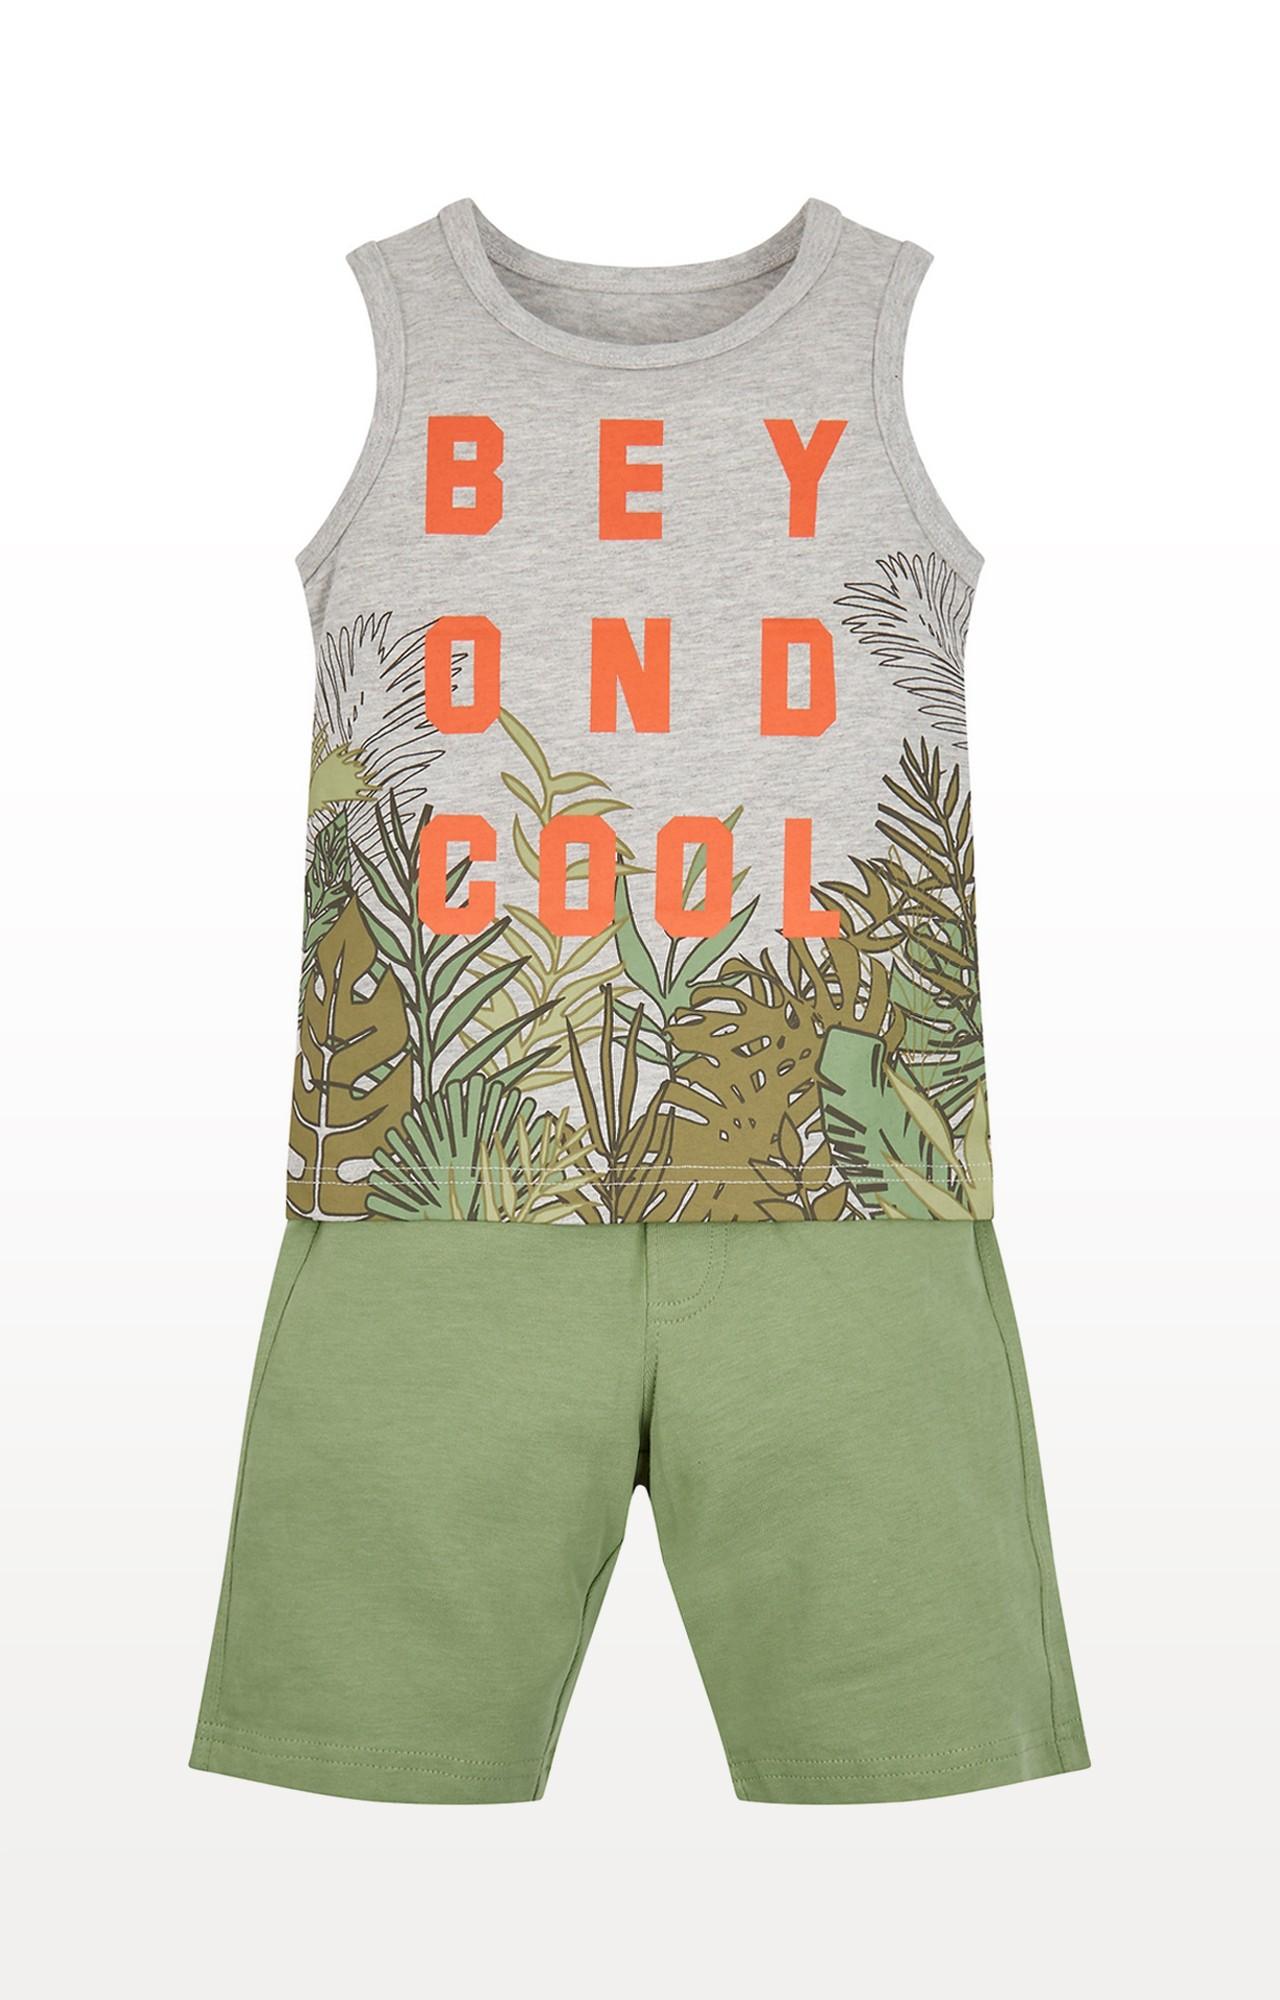 Mothercare   Grey and Green Printed T-Shirt and Pant Set